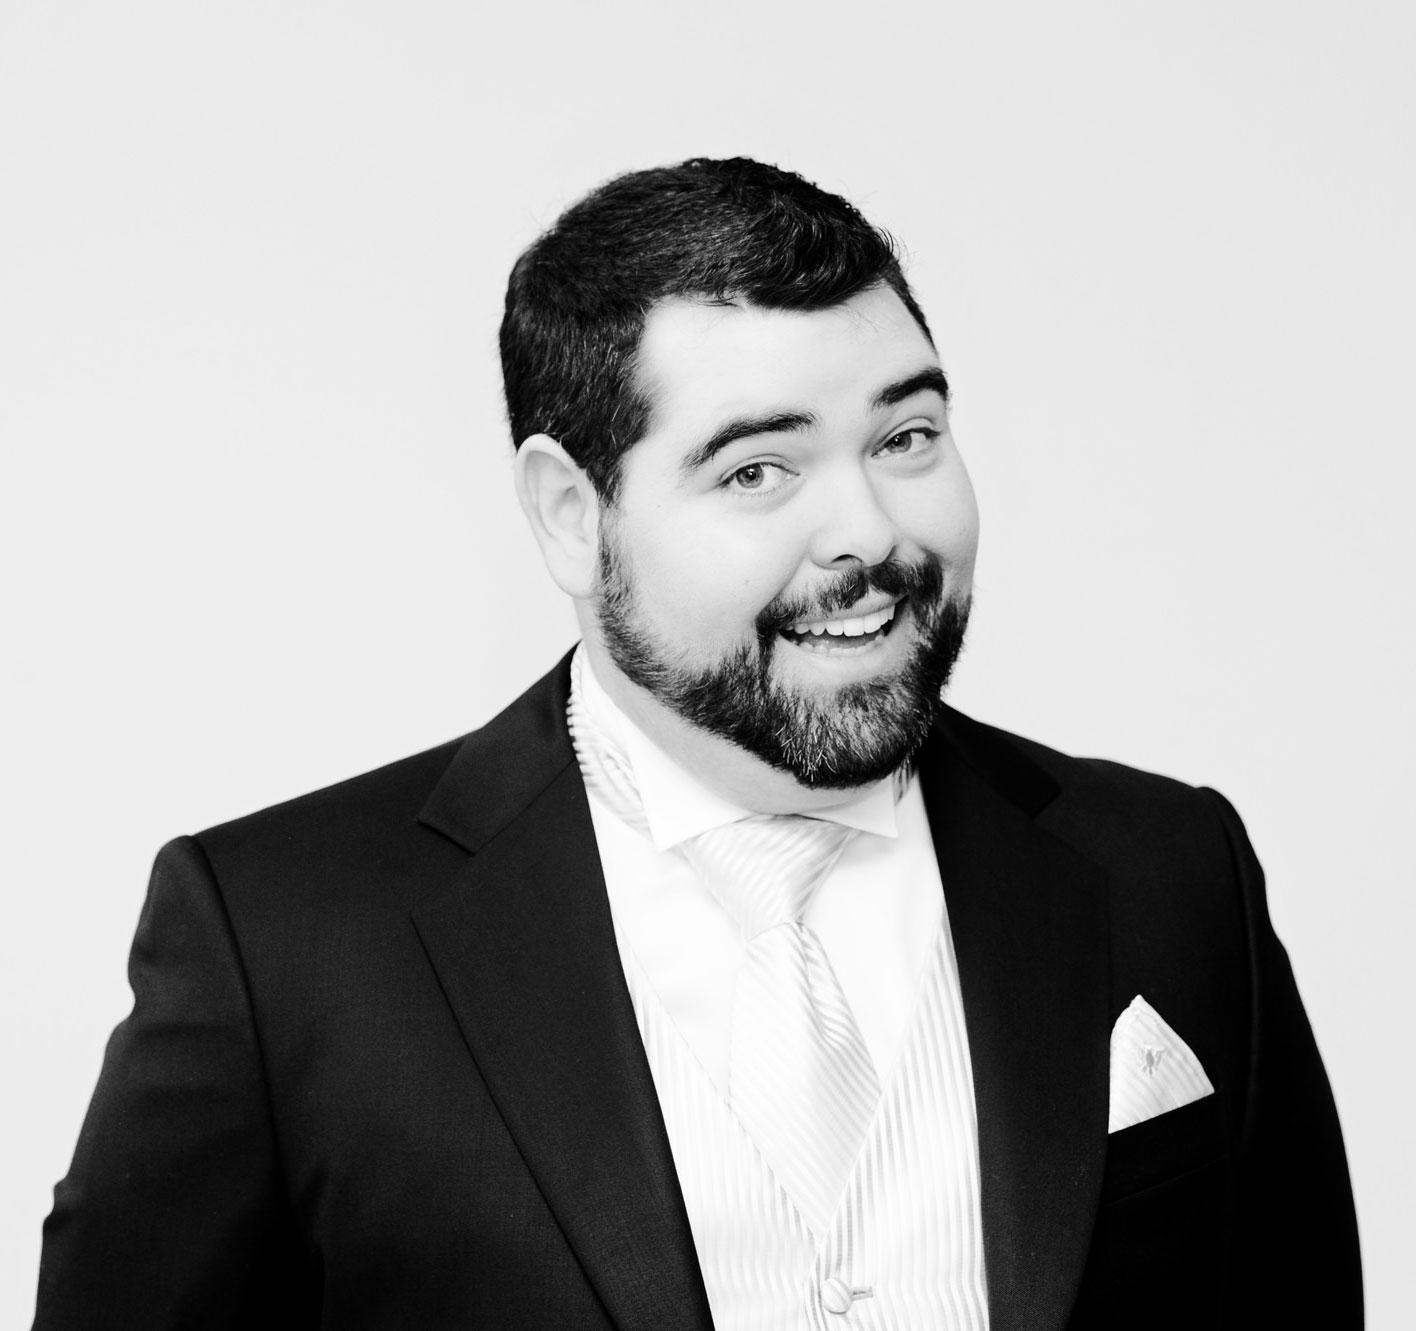 Xabier Martínez Rolán